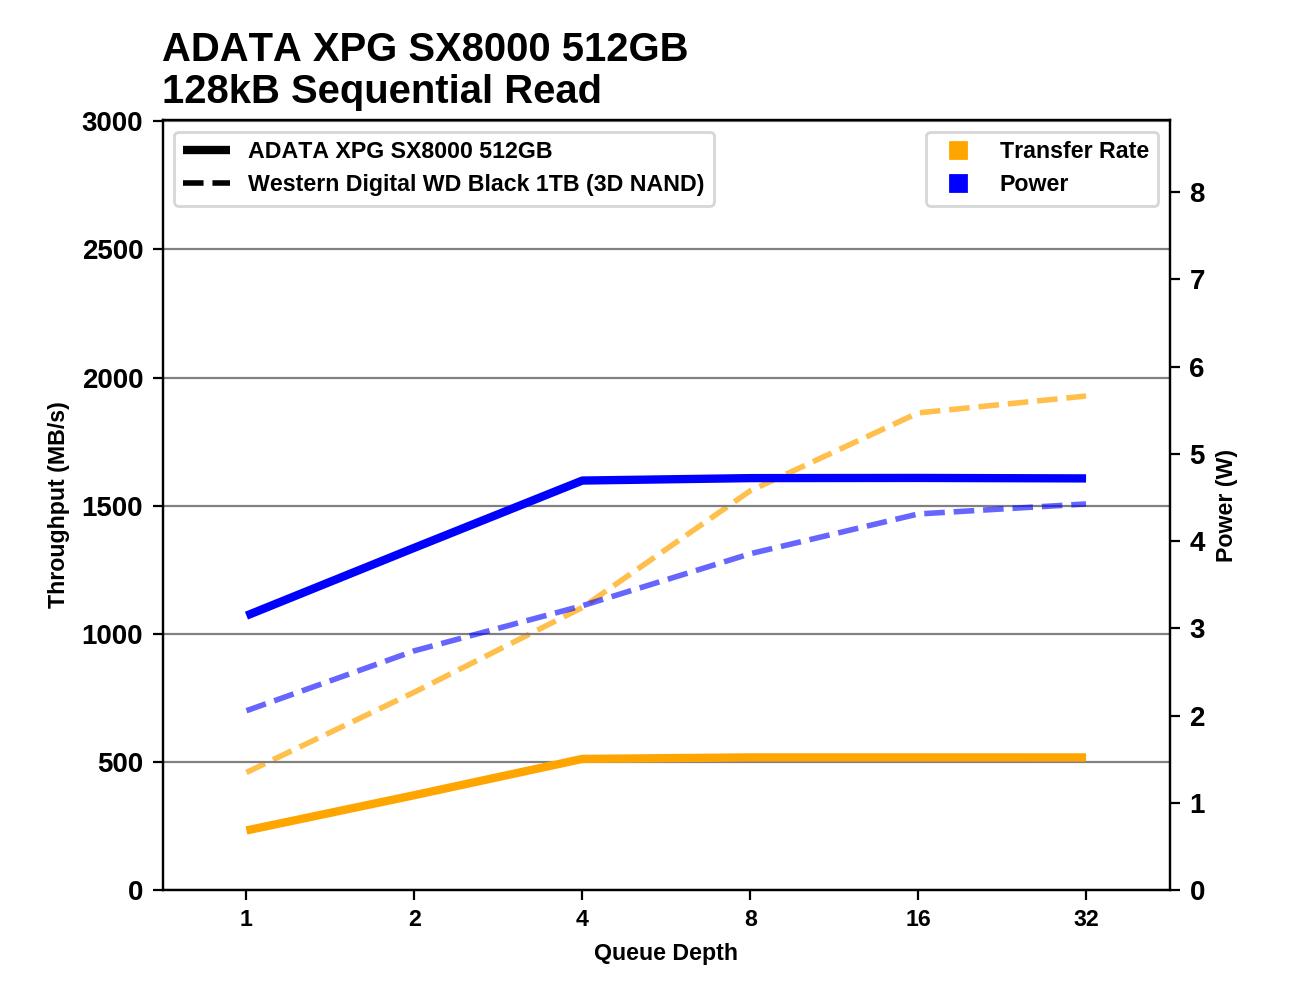 Обзор Western Digital WD Black 3D NAND SSD: EVO встретил равного - 83